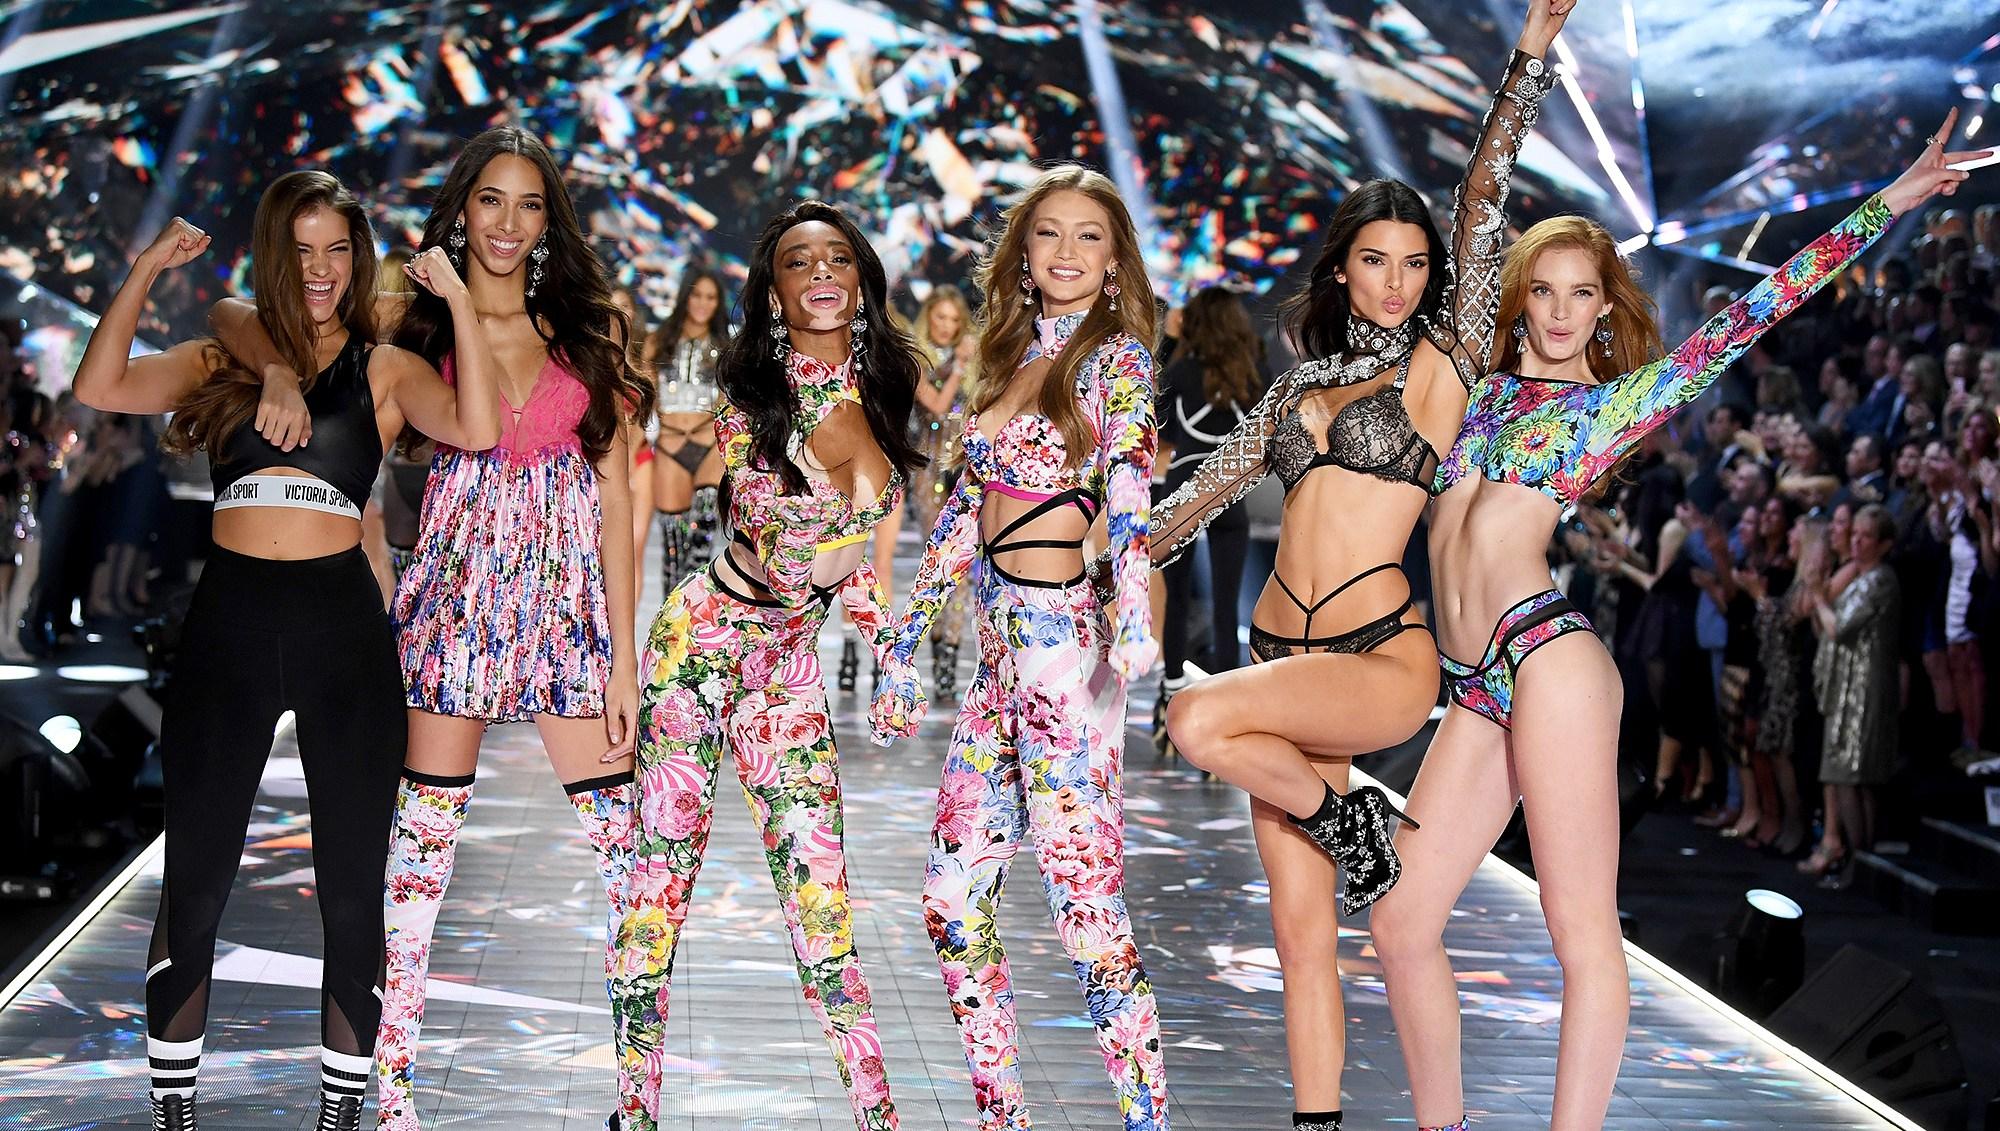 Victoria's-Secret-rethinking-annual-fashion-show